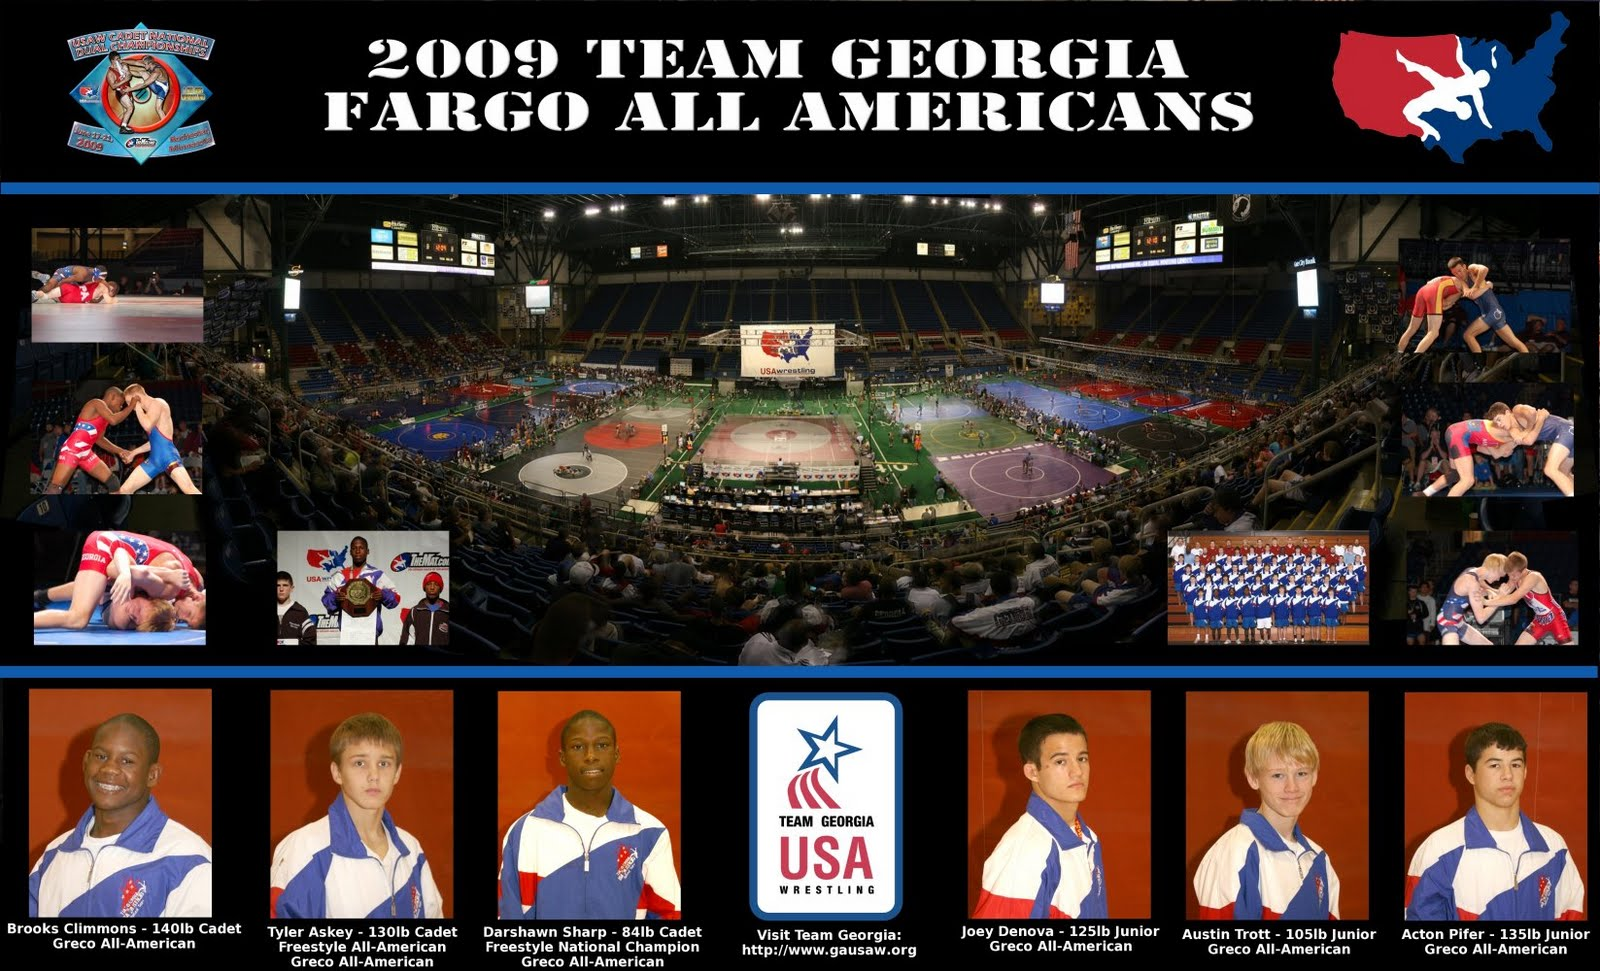 http://4.bp.blogspot.com/_8pAika_cR-A/TUk-OqZ66eI/AAAAAAAAAz4/eMgPjJe8S28/s1600/2009_tga_all_american_poster-789696.jpg